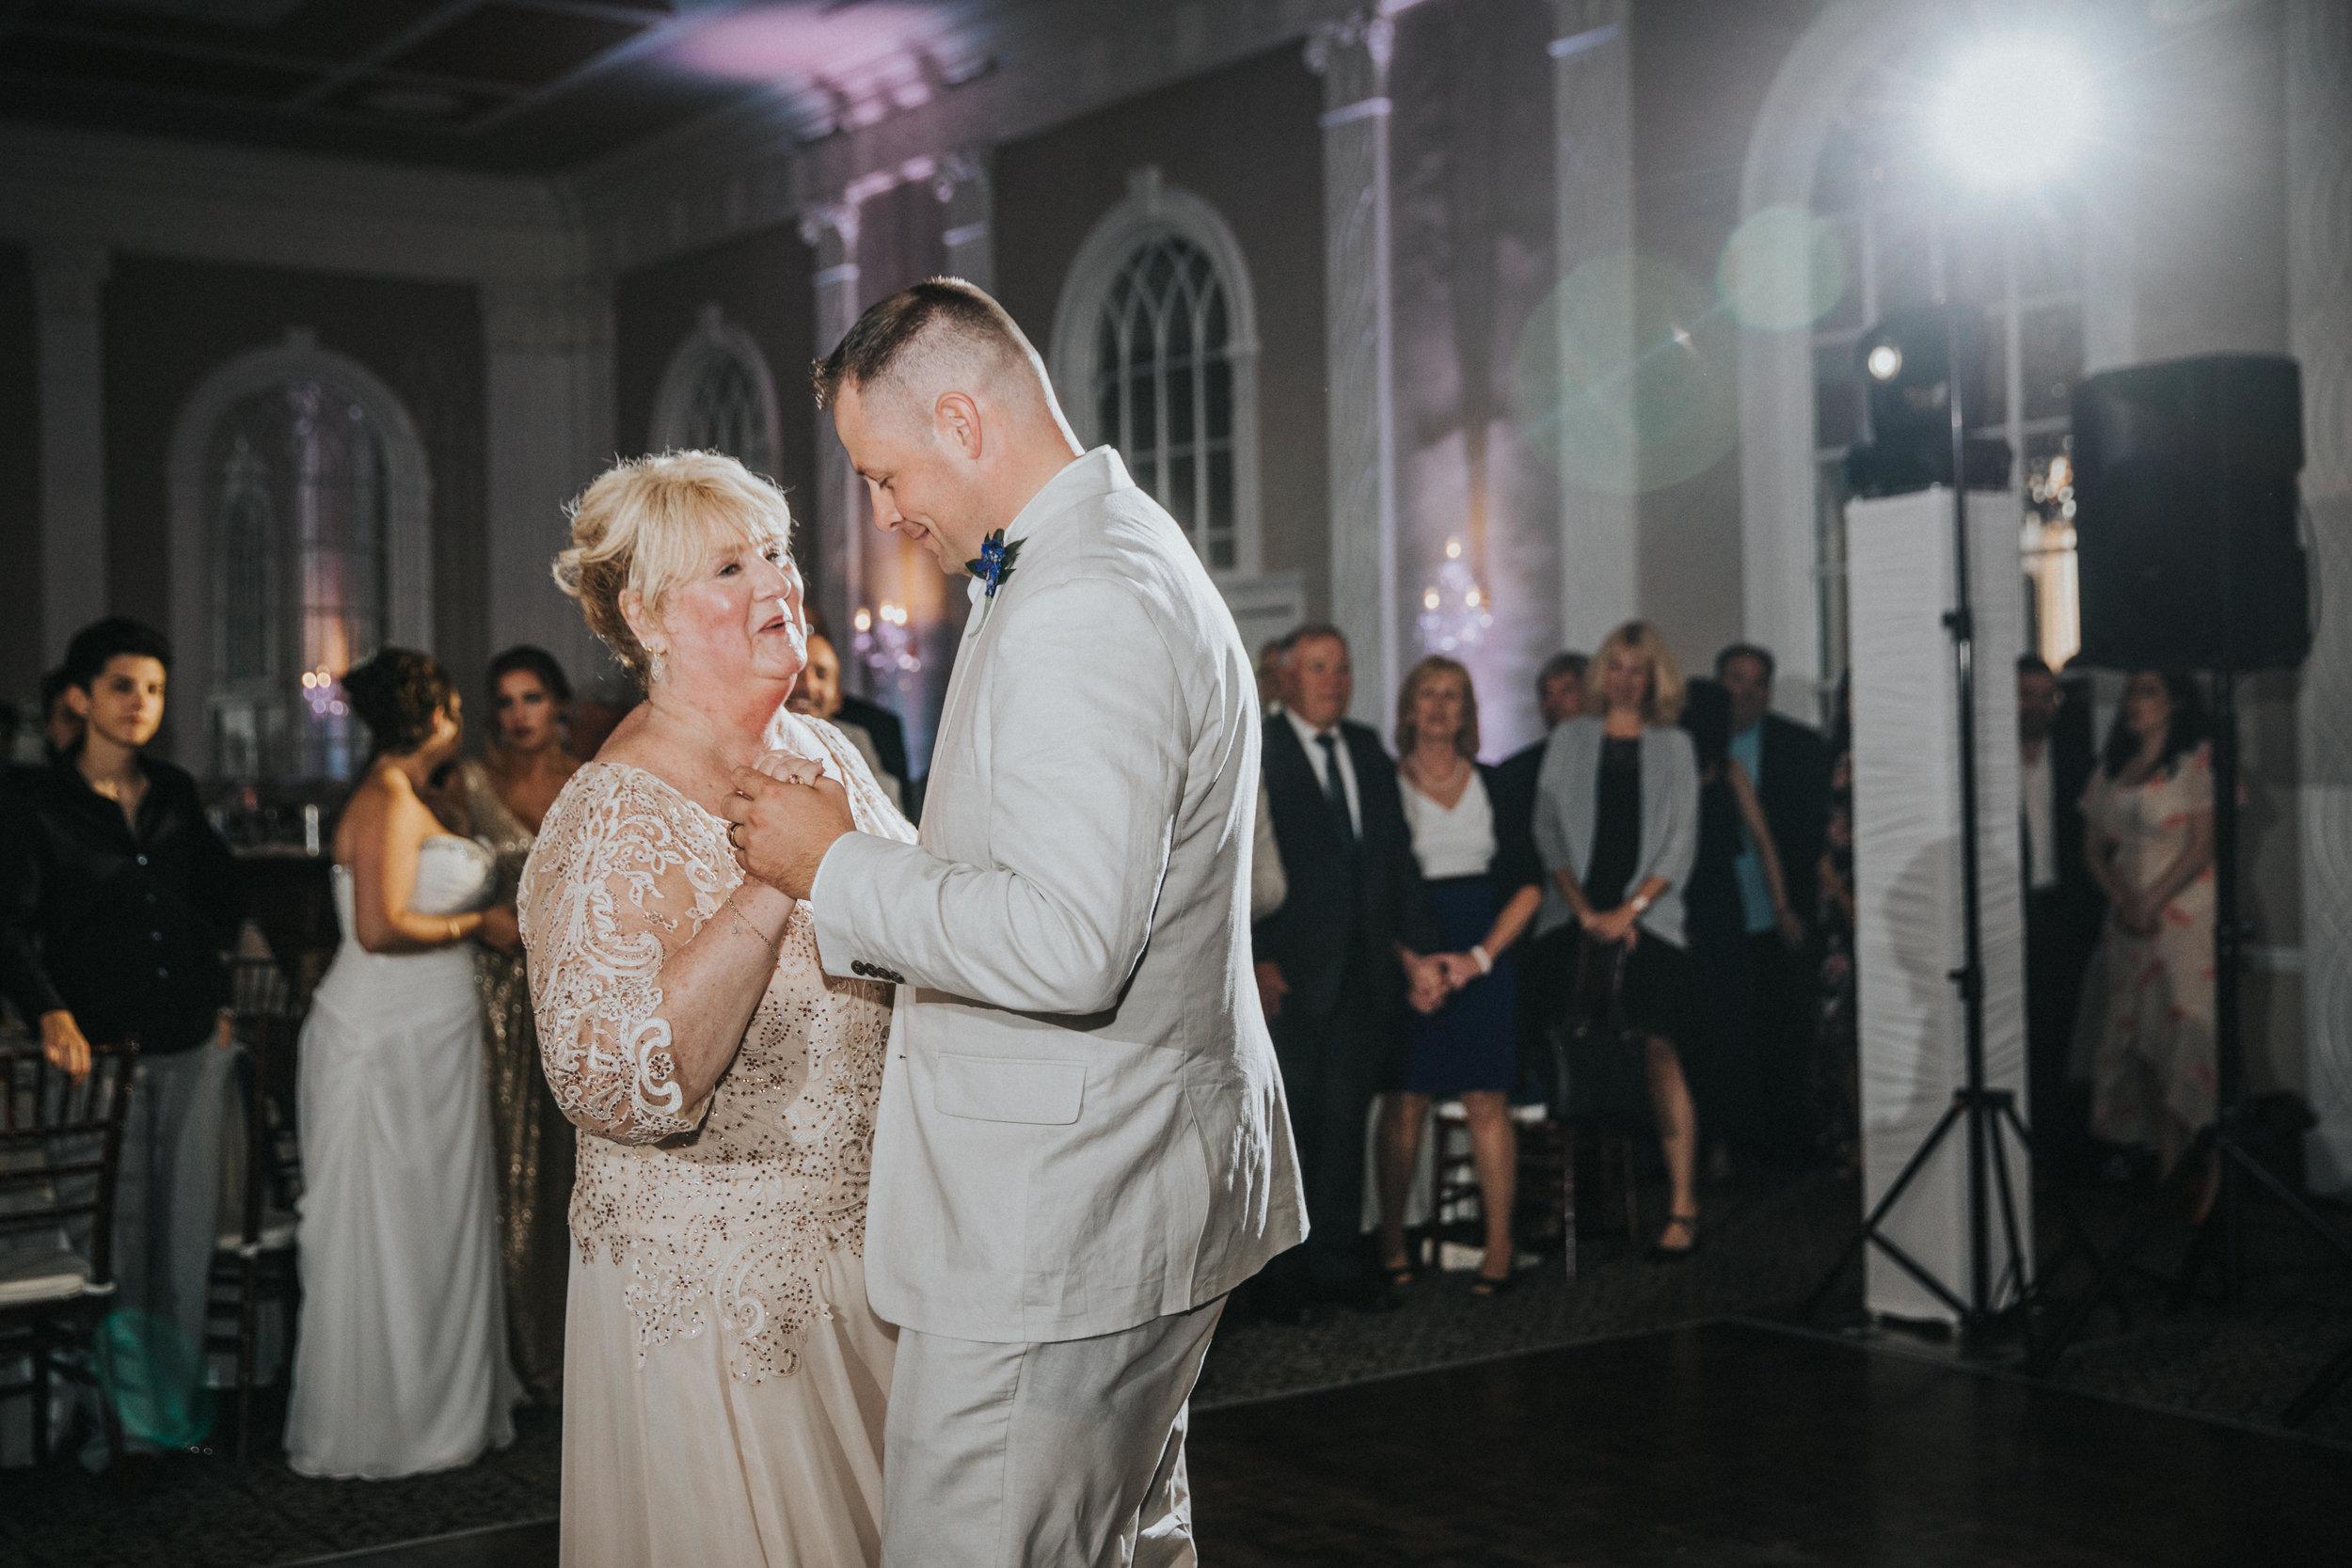 JennaLynnPhotography-NJWeddingPhotographer-Wedding-TheBerkeley-AsburyPark-Allison&Michael-Reception-42.jpg